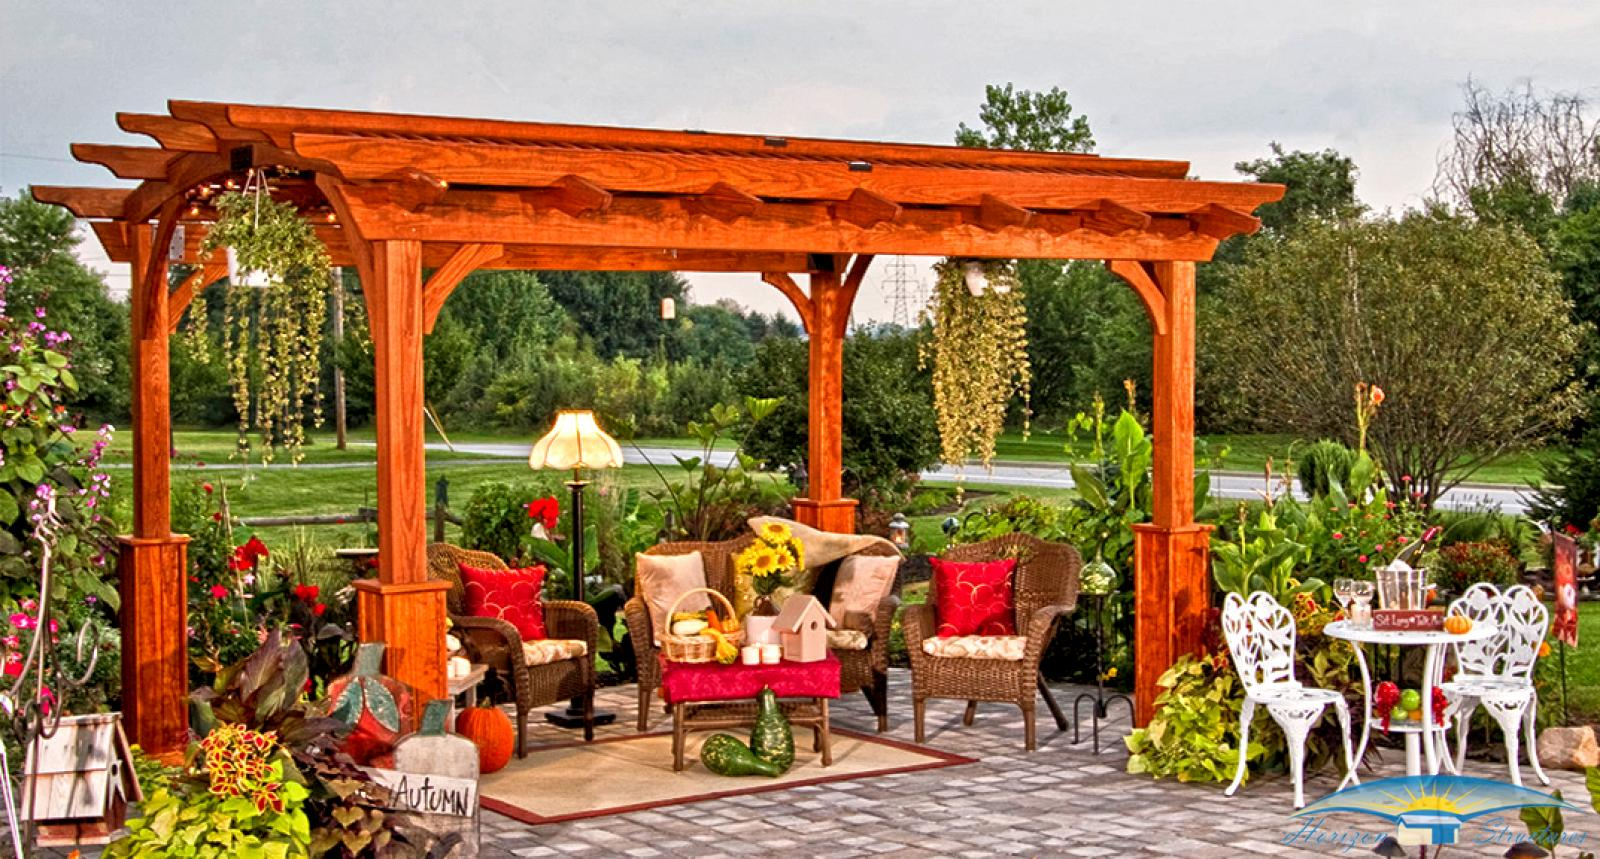 outdoor-living-pergola-hearthside-10 x 13-cedar-stain-lattice-roof-and-superior-posts